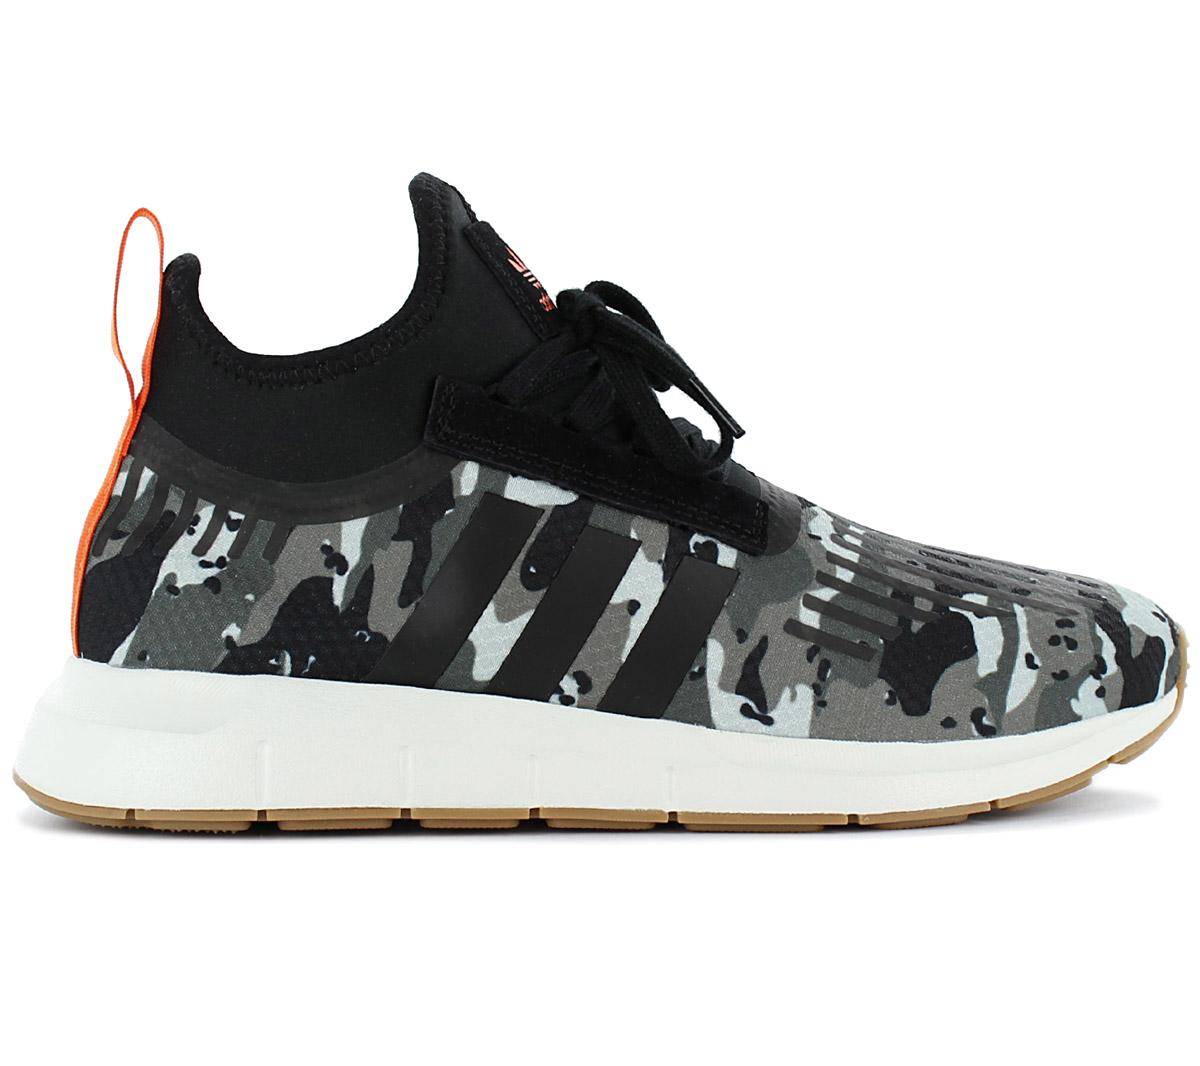 Details about Adidas Originals Swift Run Barrier Men's Sneaker B42234 Camouflage Shoes New